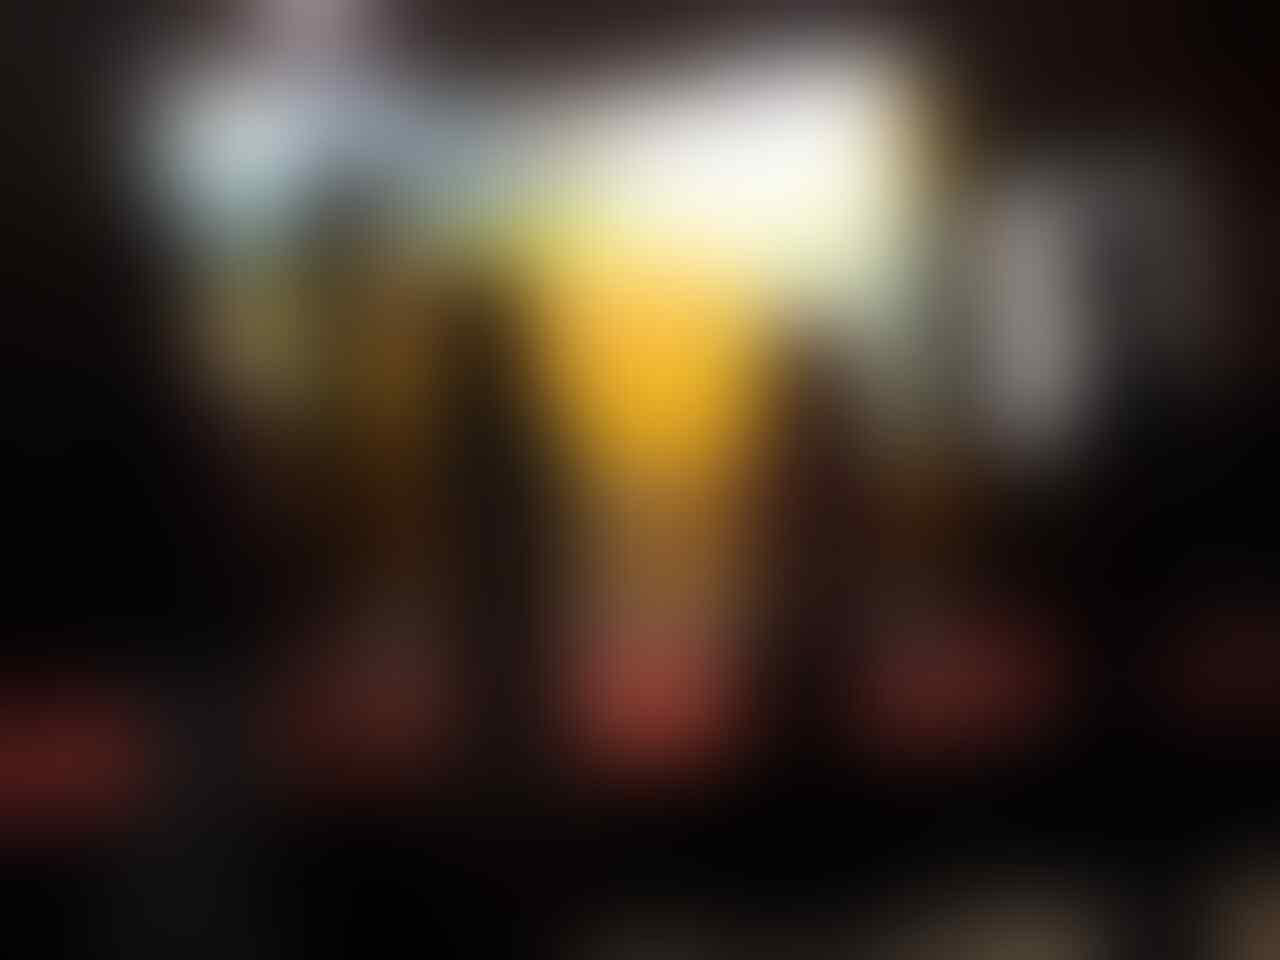 [Field Report] Travelling Wajib Minum Tolak Angin #CaraPintarGueMTE